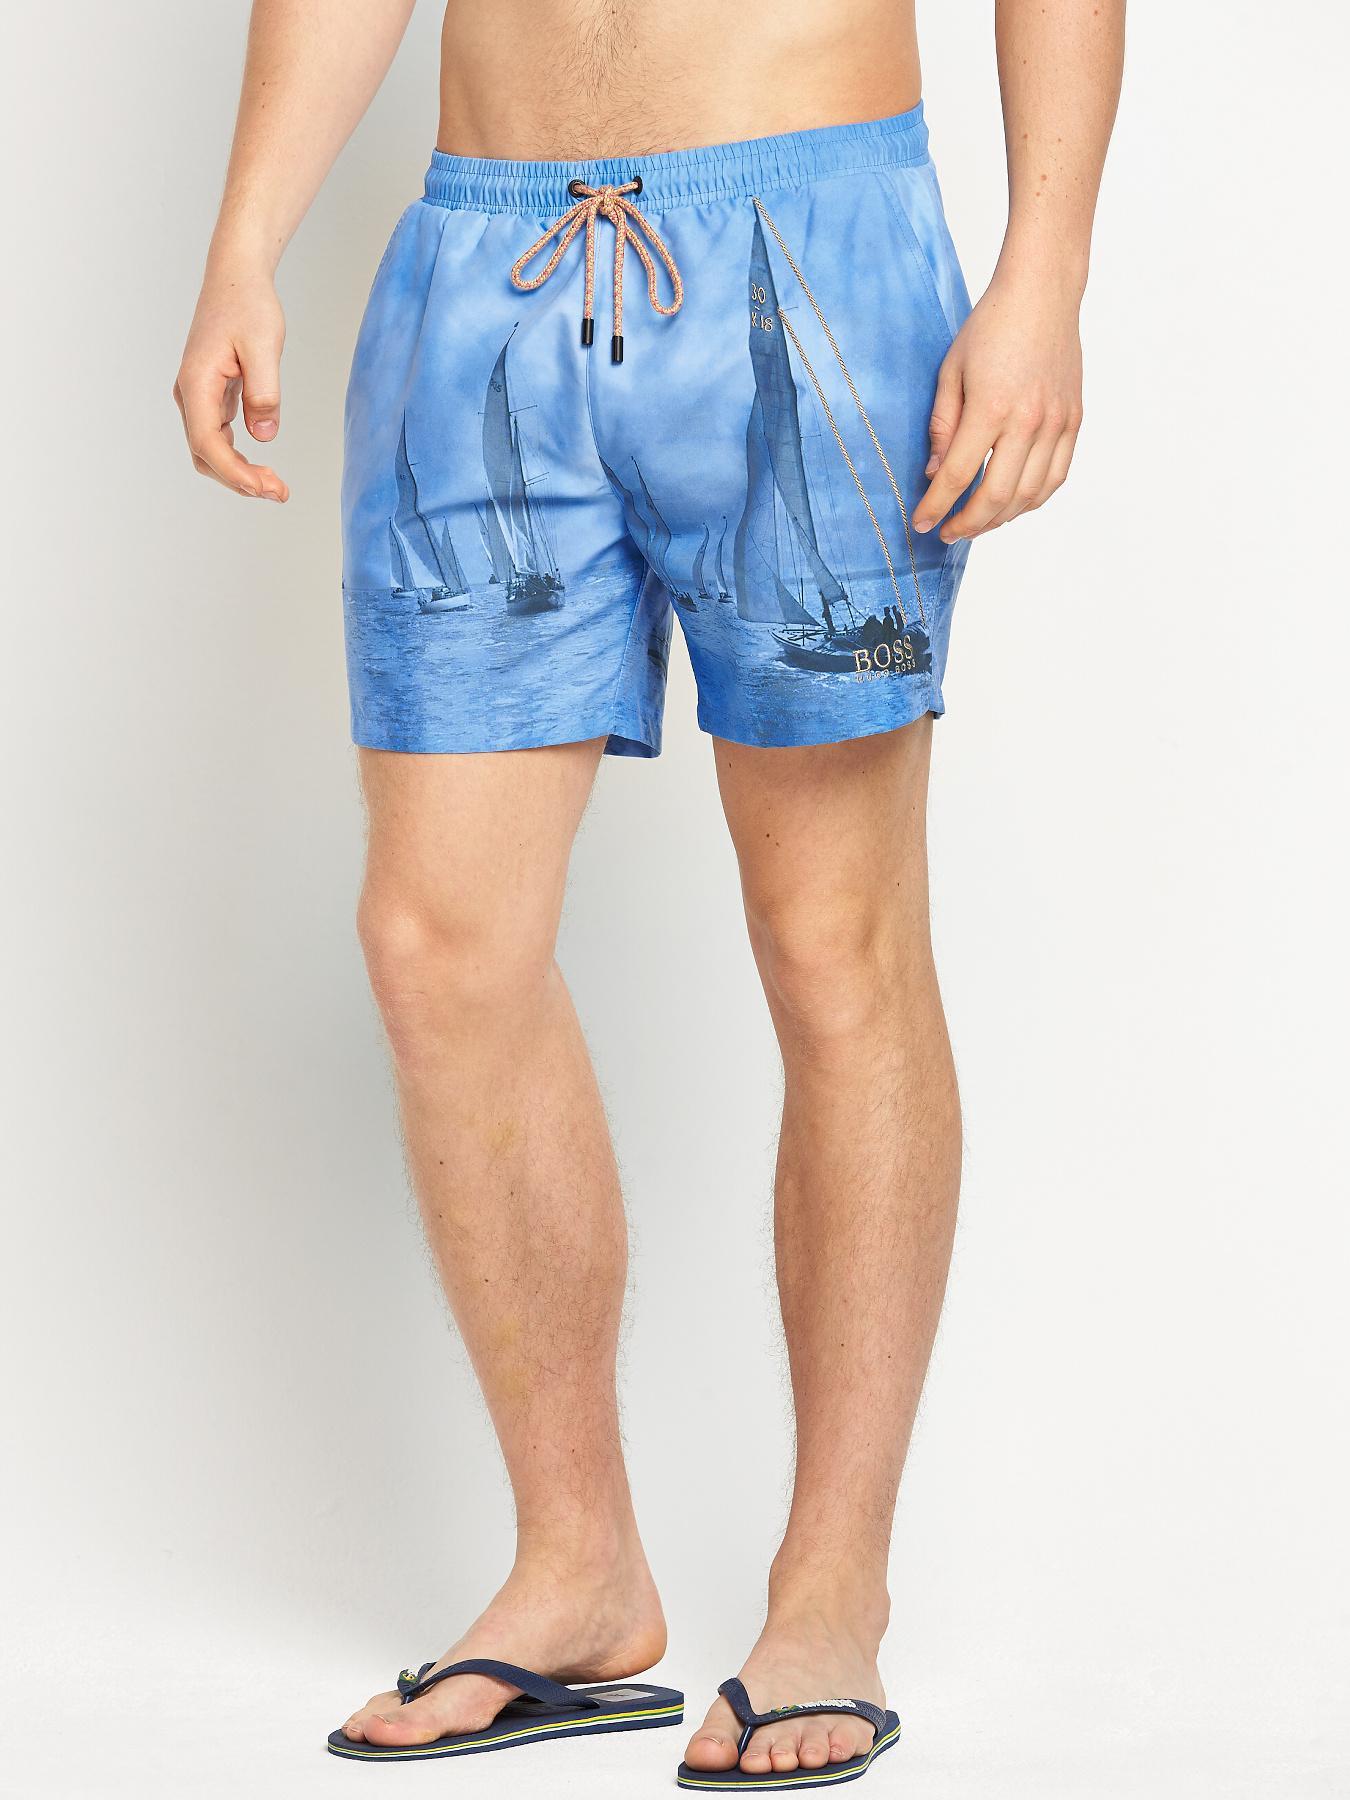 Hugo Boss Mens Springfish Swimshorts - Blue, Blue